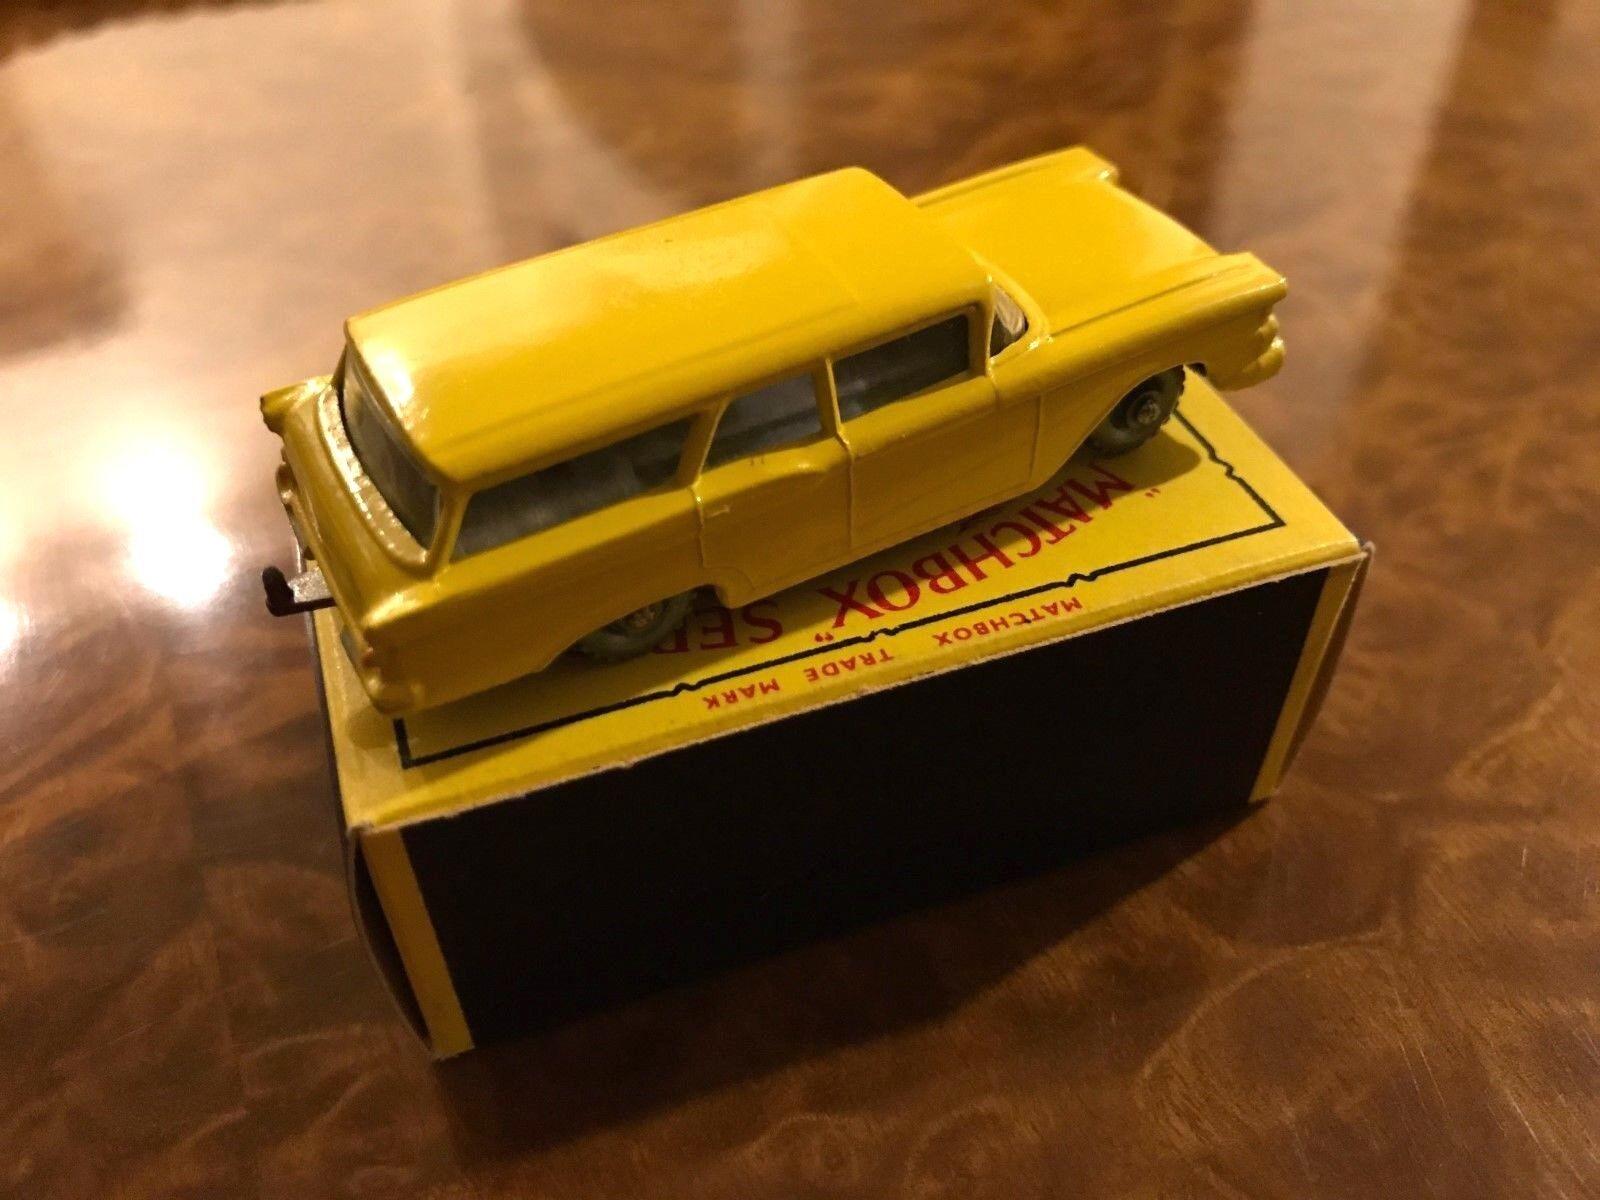 Vintage Matchbox   État Neuf + Boîte   Rare Ford Wagon   Jour 1 Beauté   N0. 31